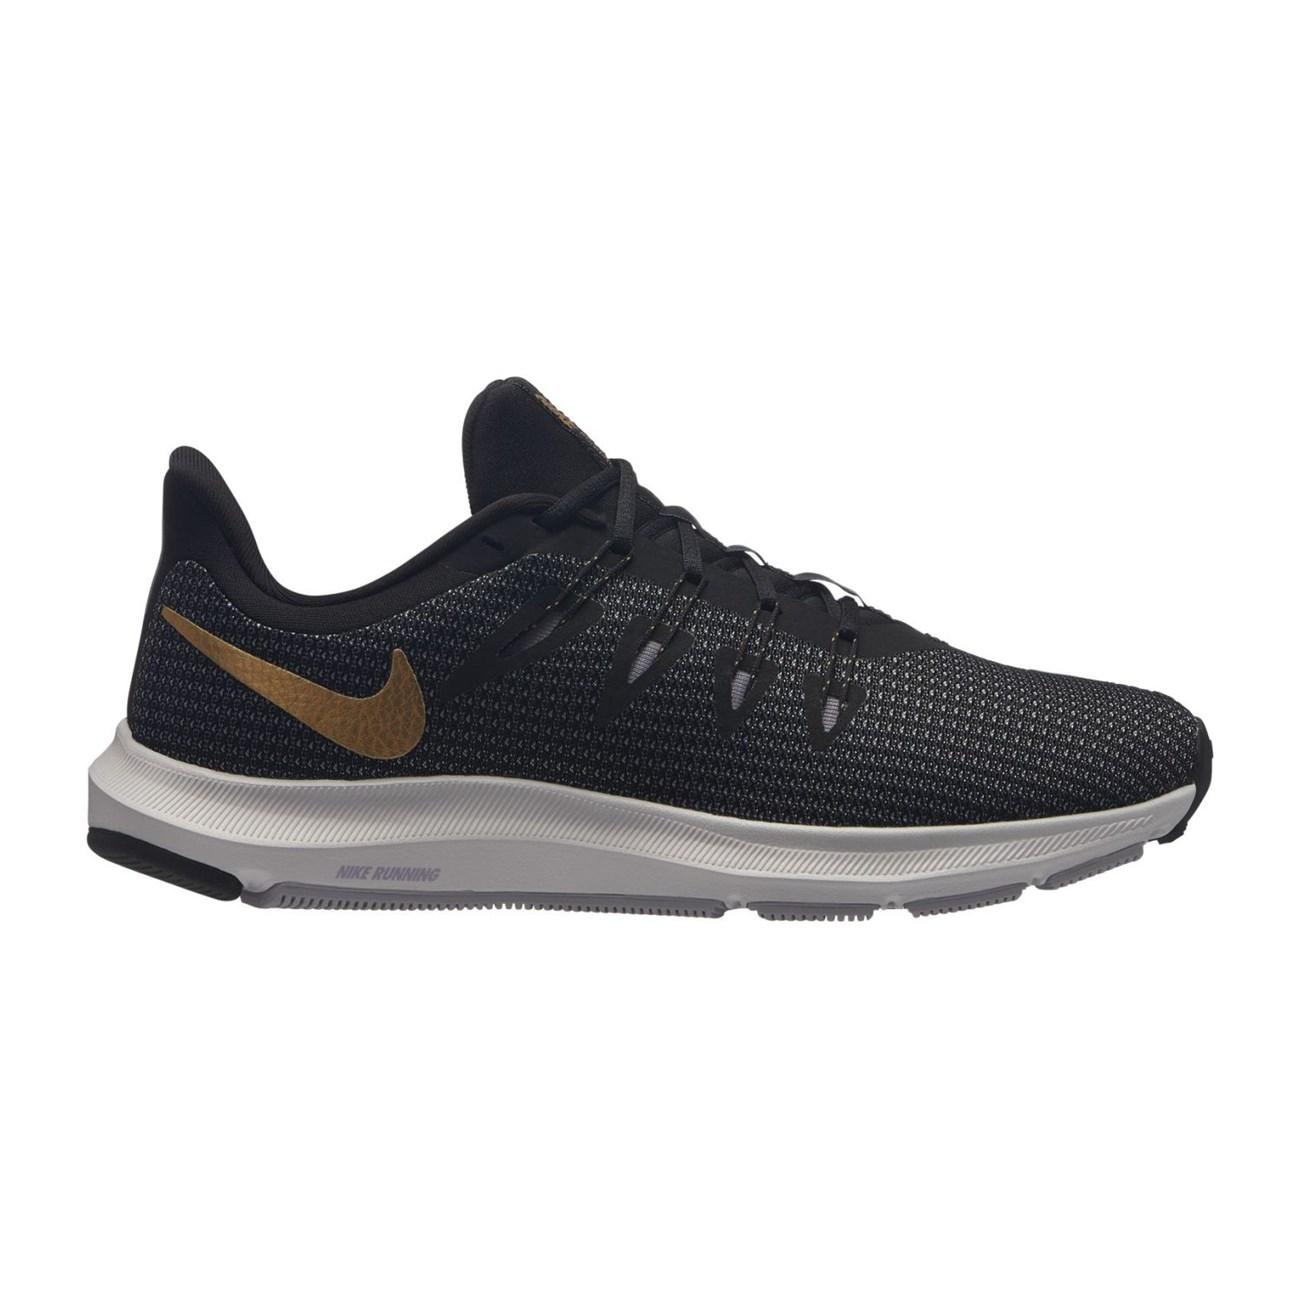 d91425f5a7c NIKE QUEST W < Παπούτσια για Τρέξιμο | INTERSPORT